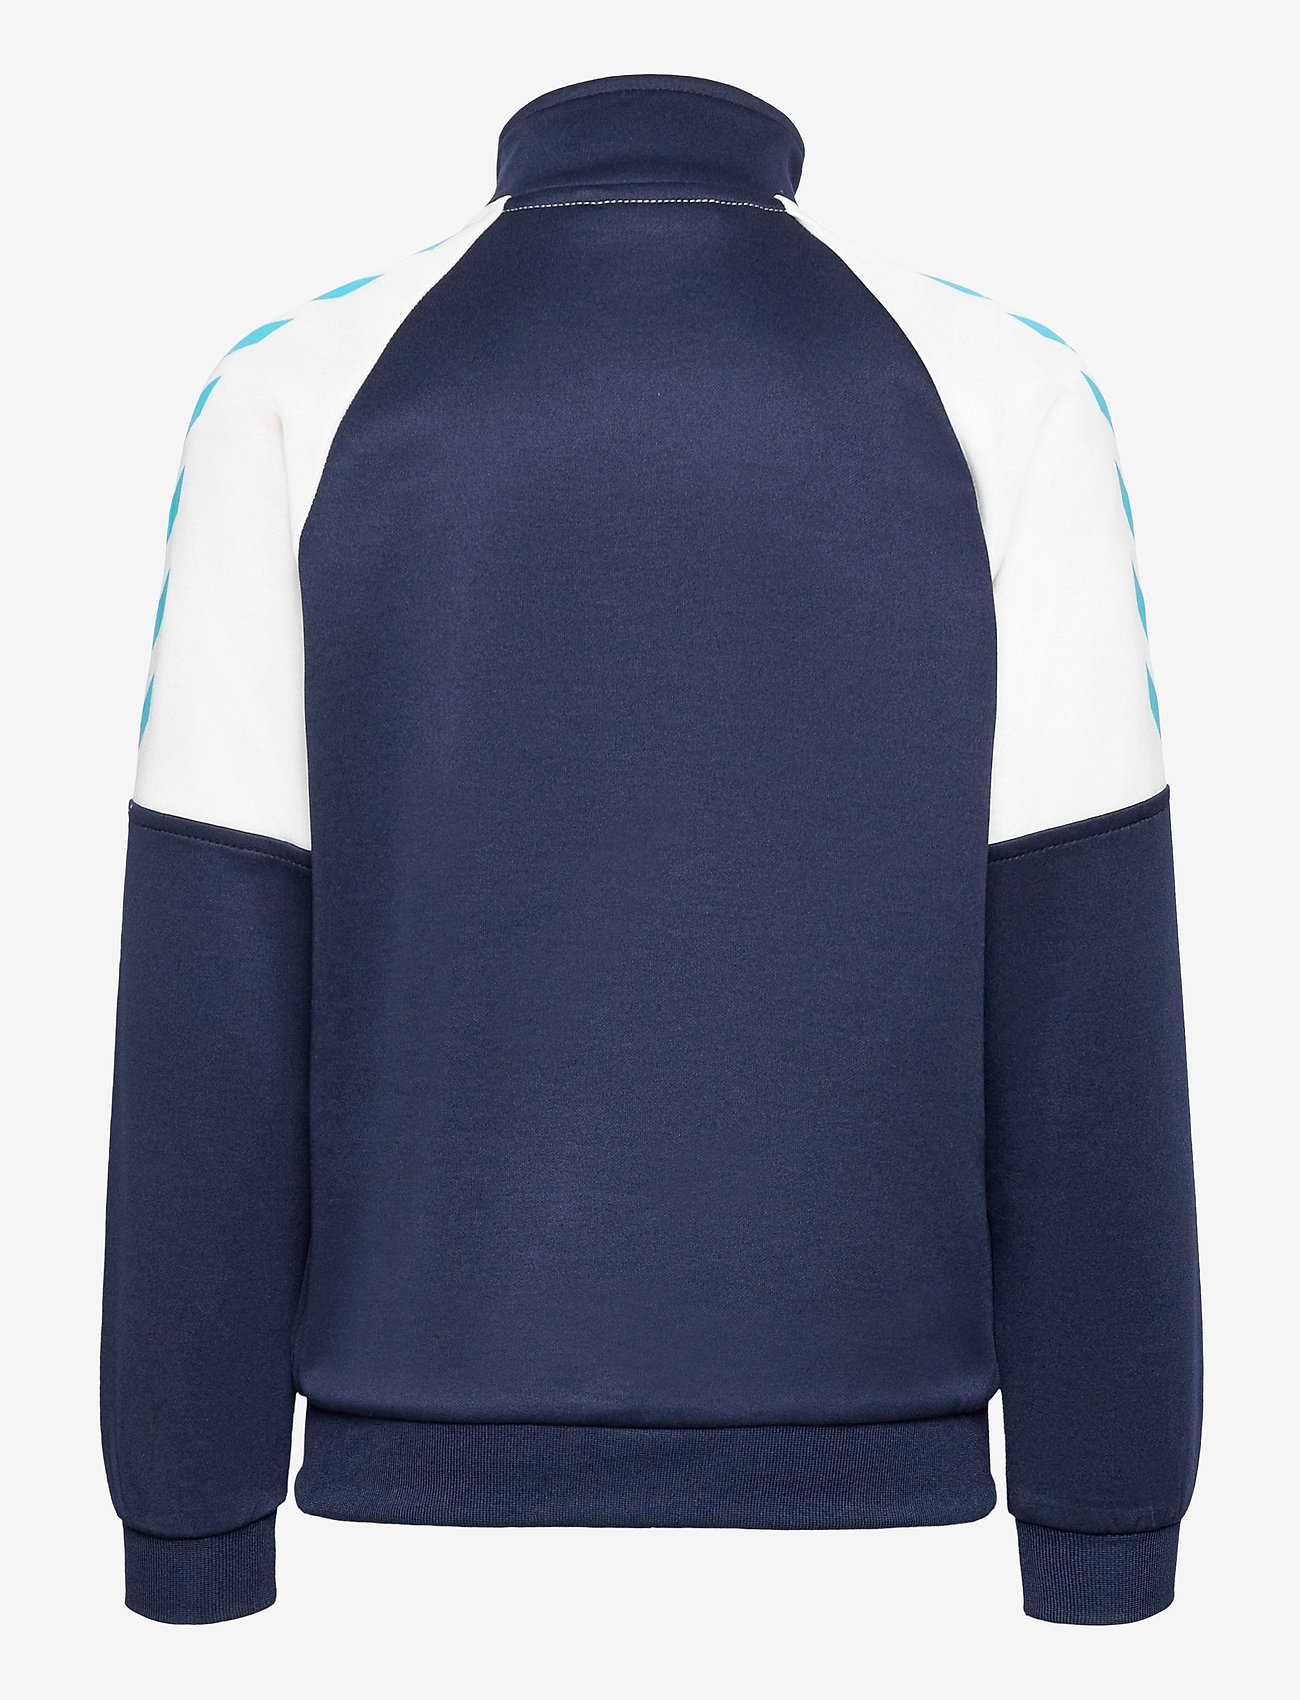 Hummel - hmlDENNIS ZIP JACKET - sweatshirts - black iris - 1